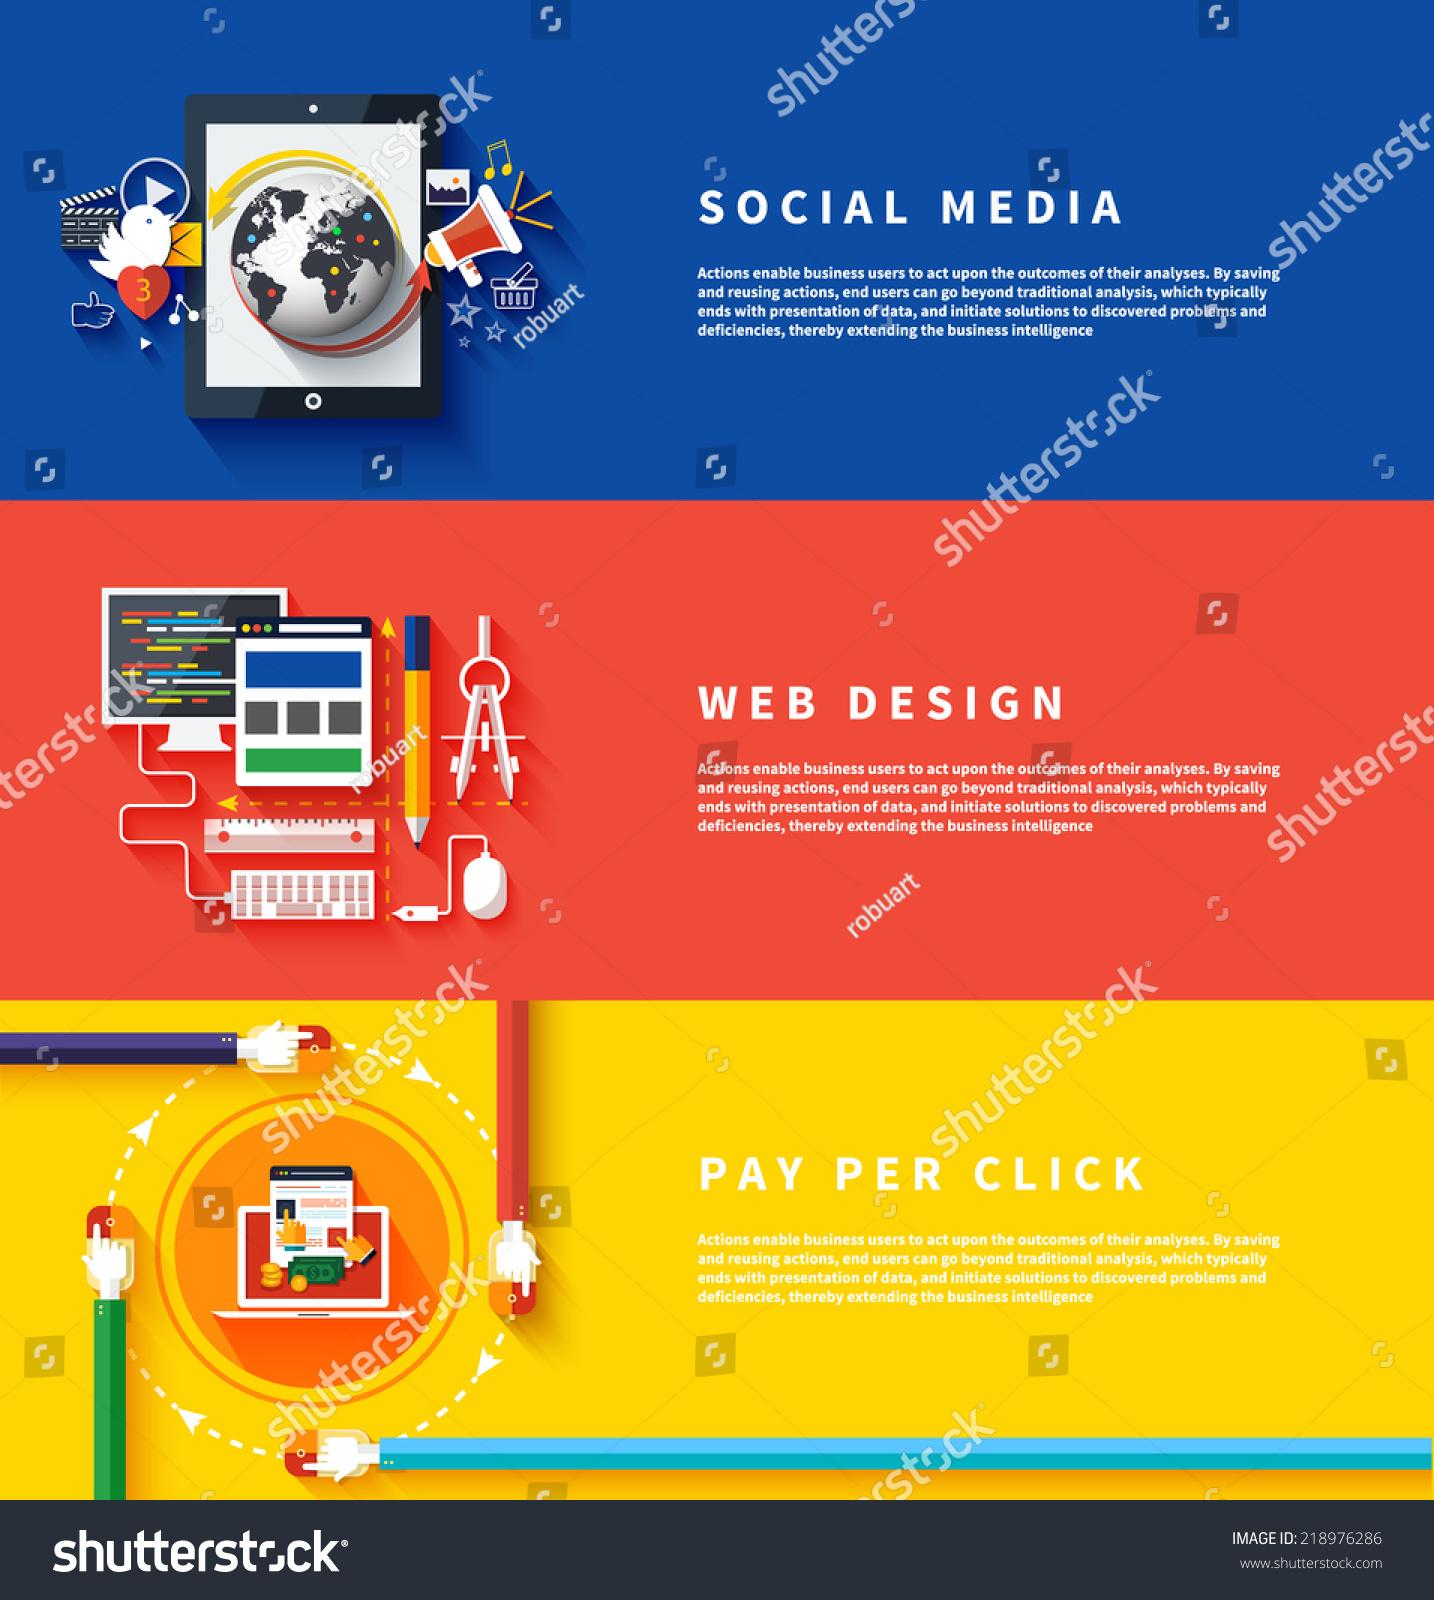 Icons Web Design Seo Social Media Stock Vector Royalty Free 218976286